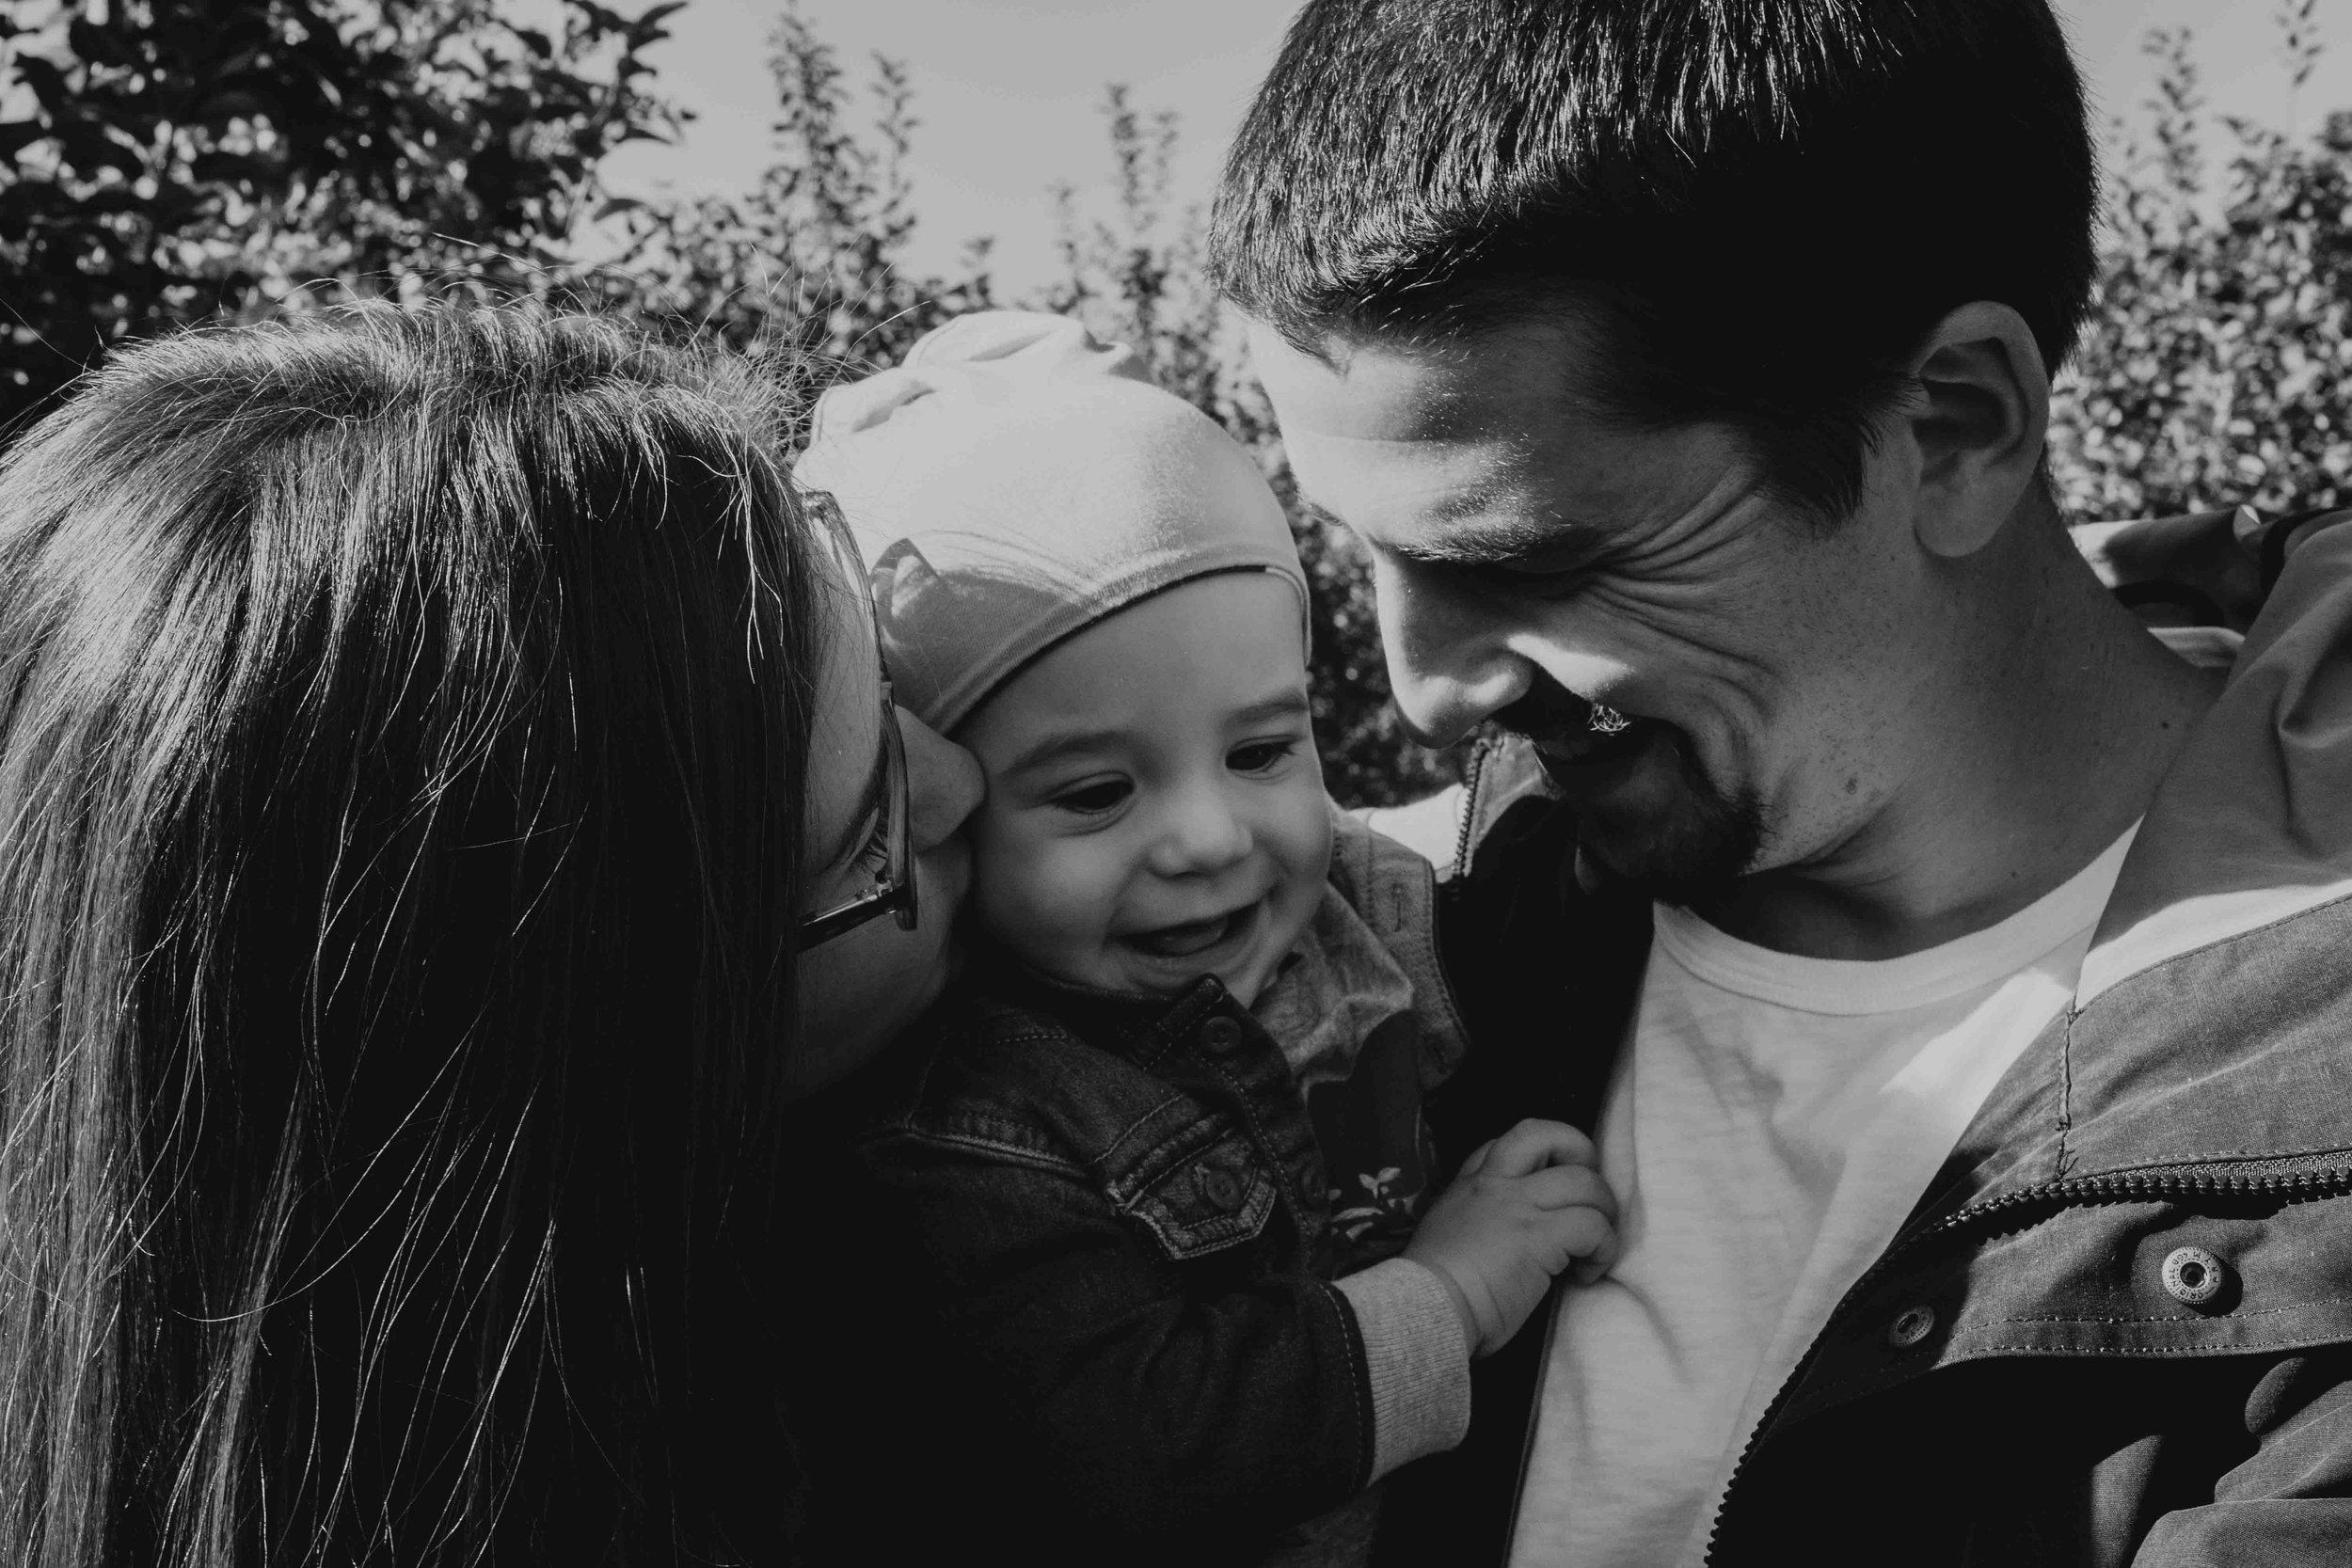 20180922_Toronto Lifestyle Family Photographer - Ali Happer Photo_5.jpg